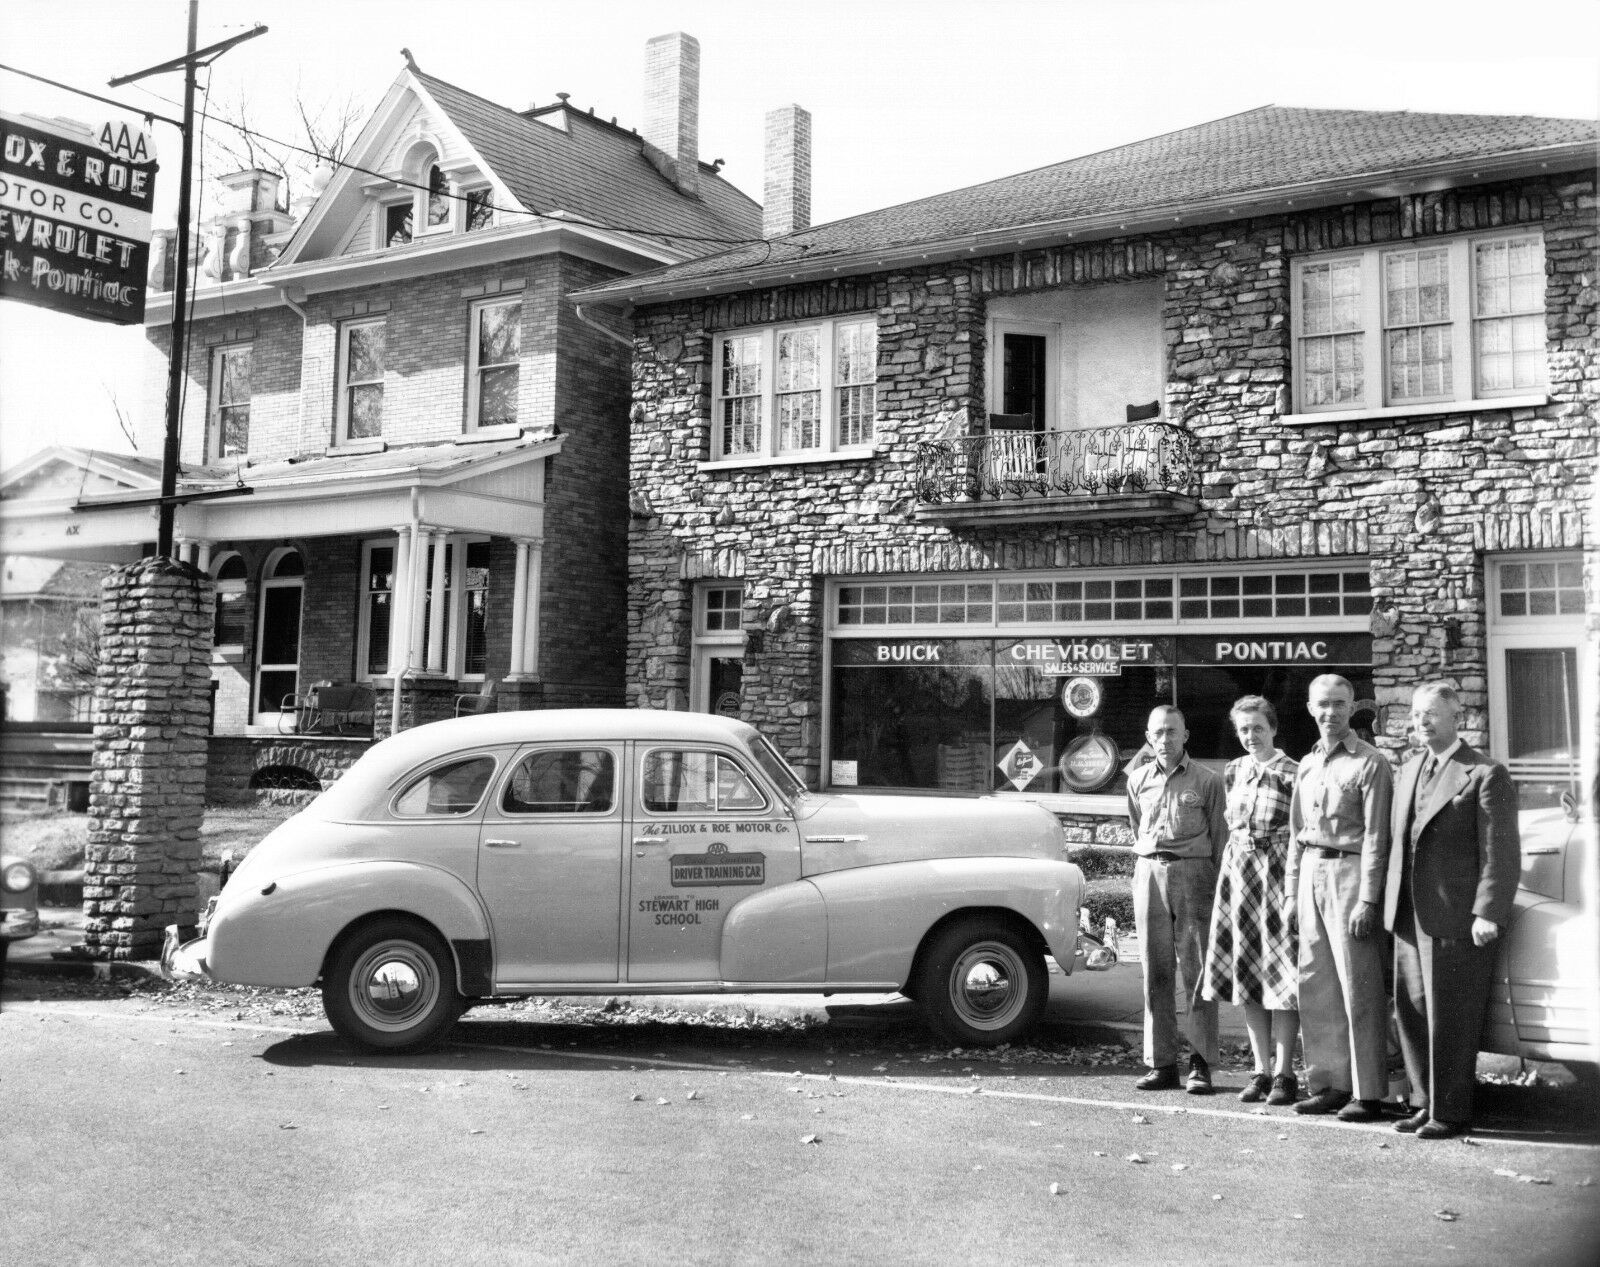 1940s-Buick-Chevy-Pontiac-Dealership-Ziliox-Roe.jpg